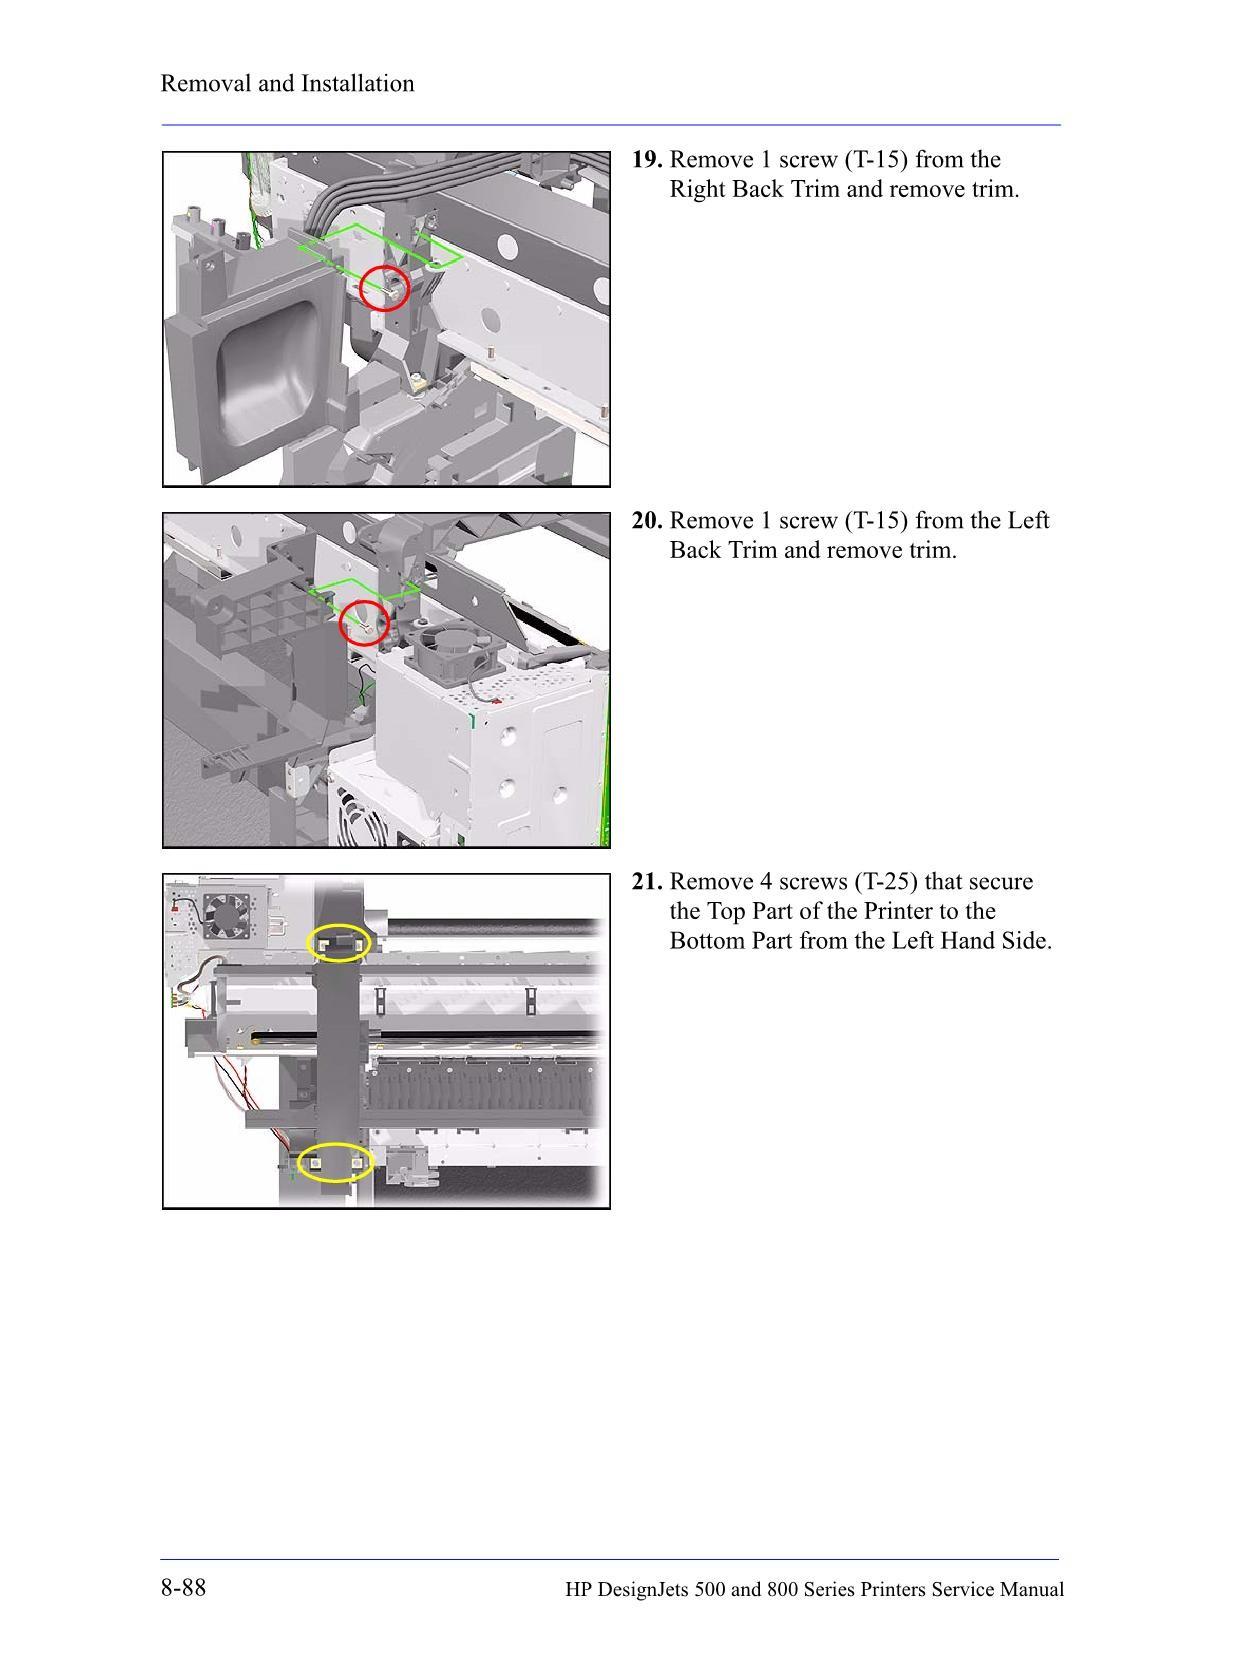 hp designjet 800 service manual pdf manual guide example 2018 u2022 rh netusermanual today hp 800 designjet service manual hp designjet 800 service manual download